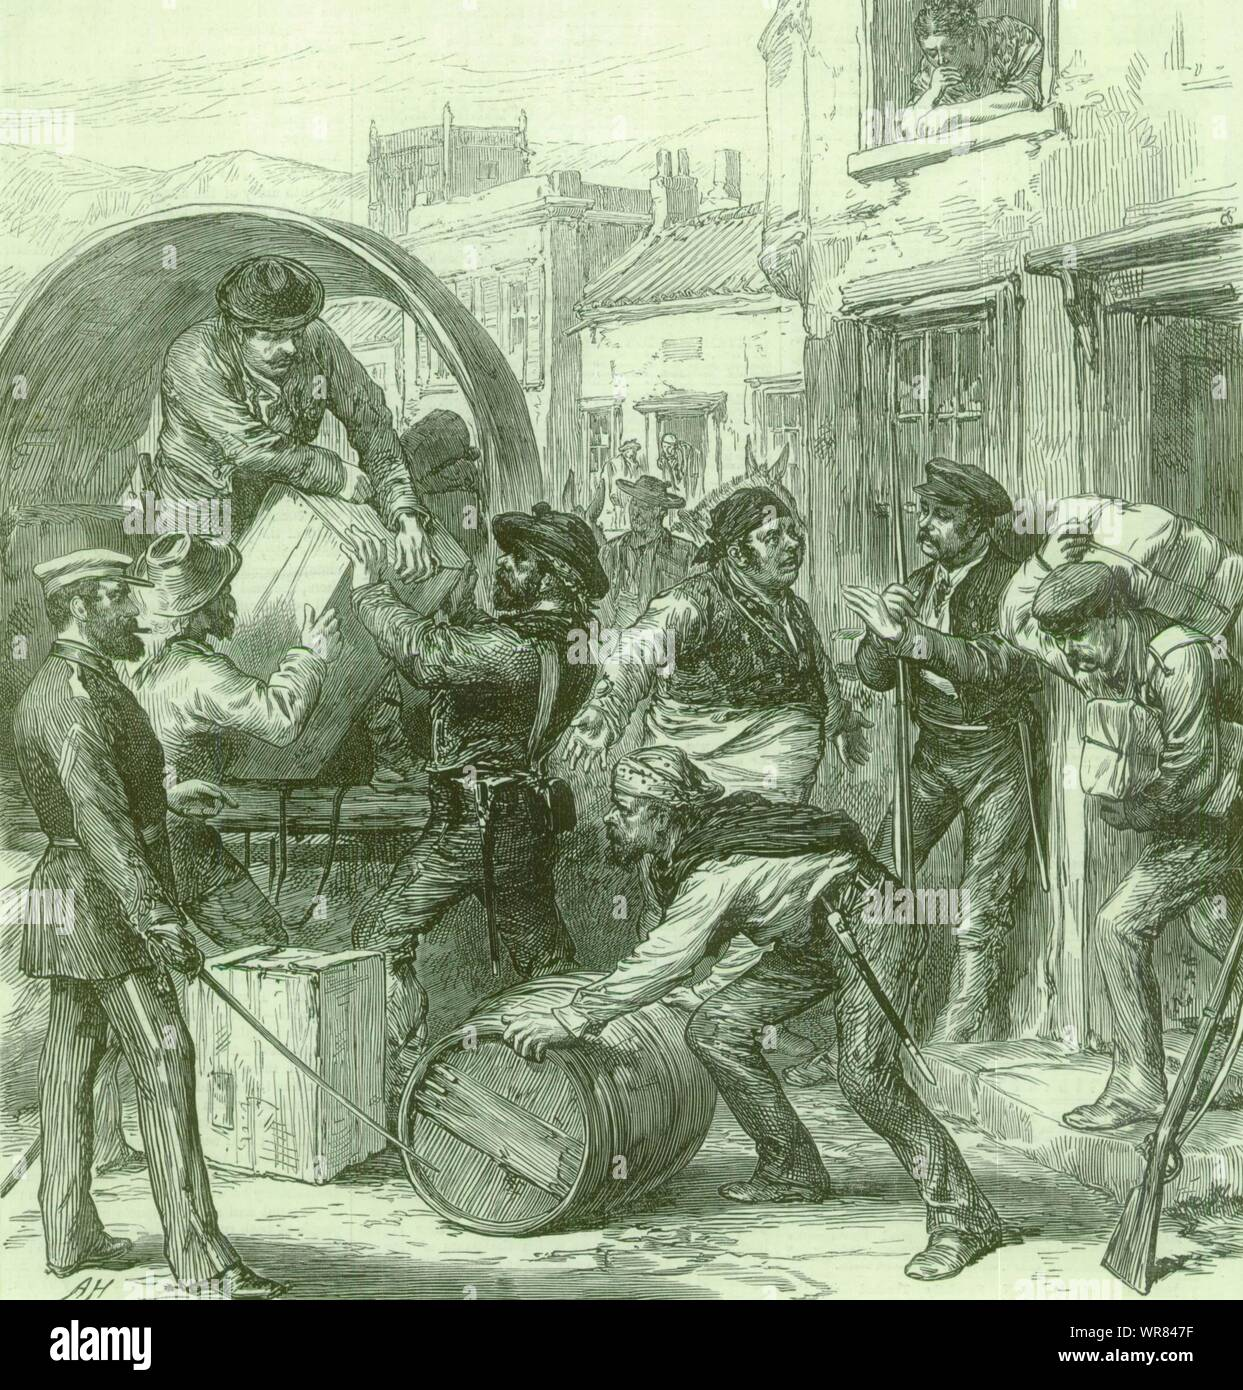 Spanish Civil War Cartagena insurgents at Torrevieja 1st Spanish Republic 1873 Stock Photo